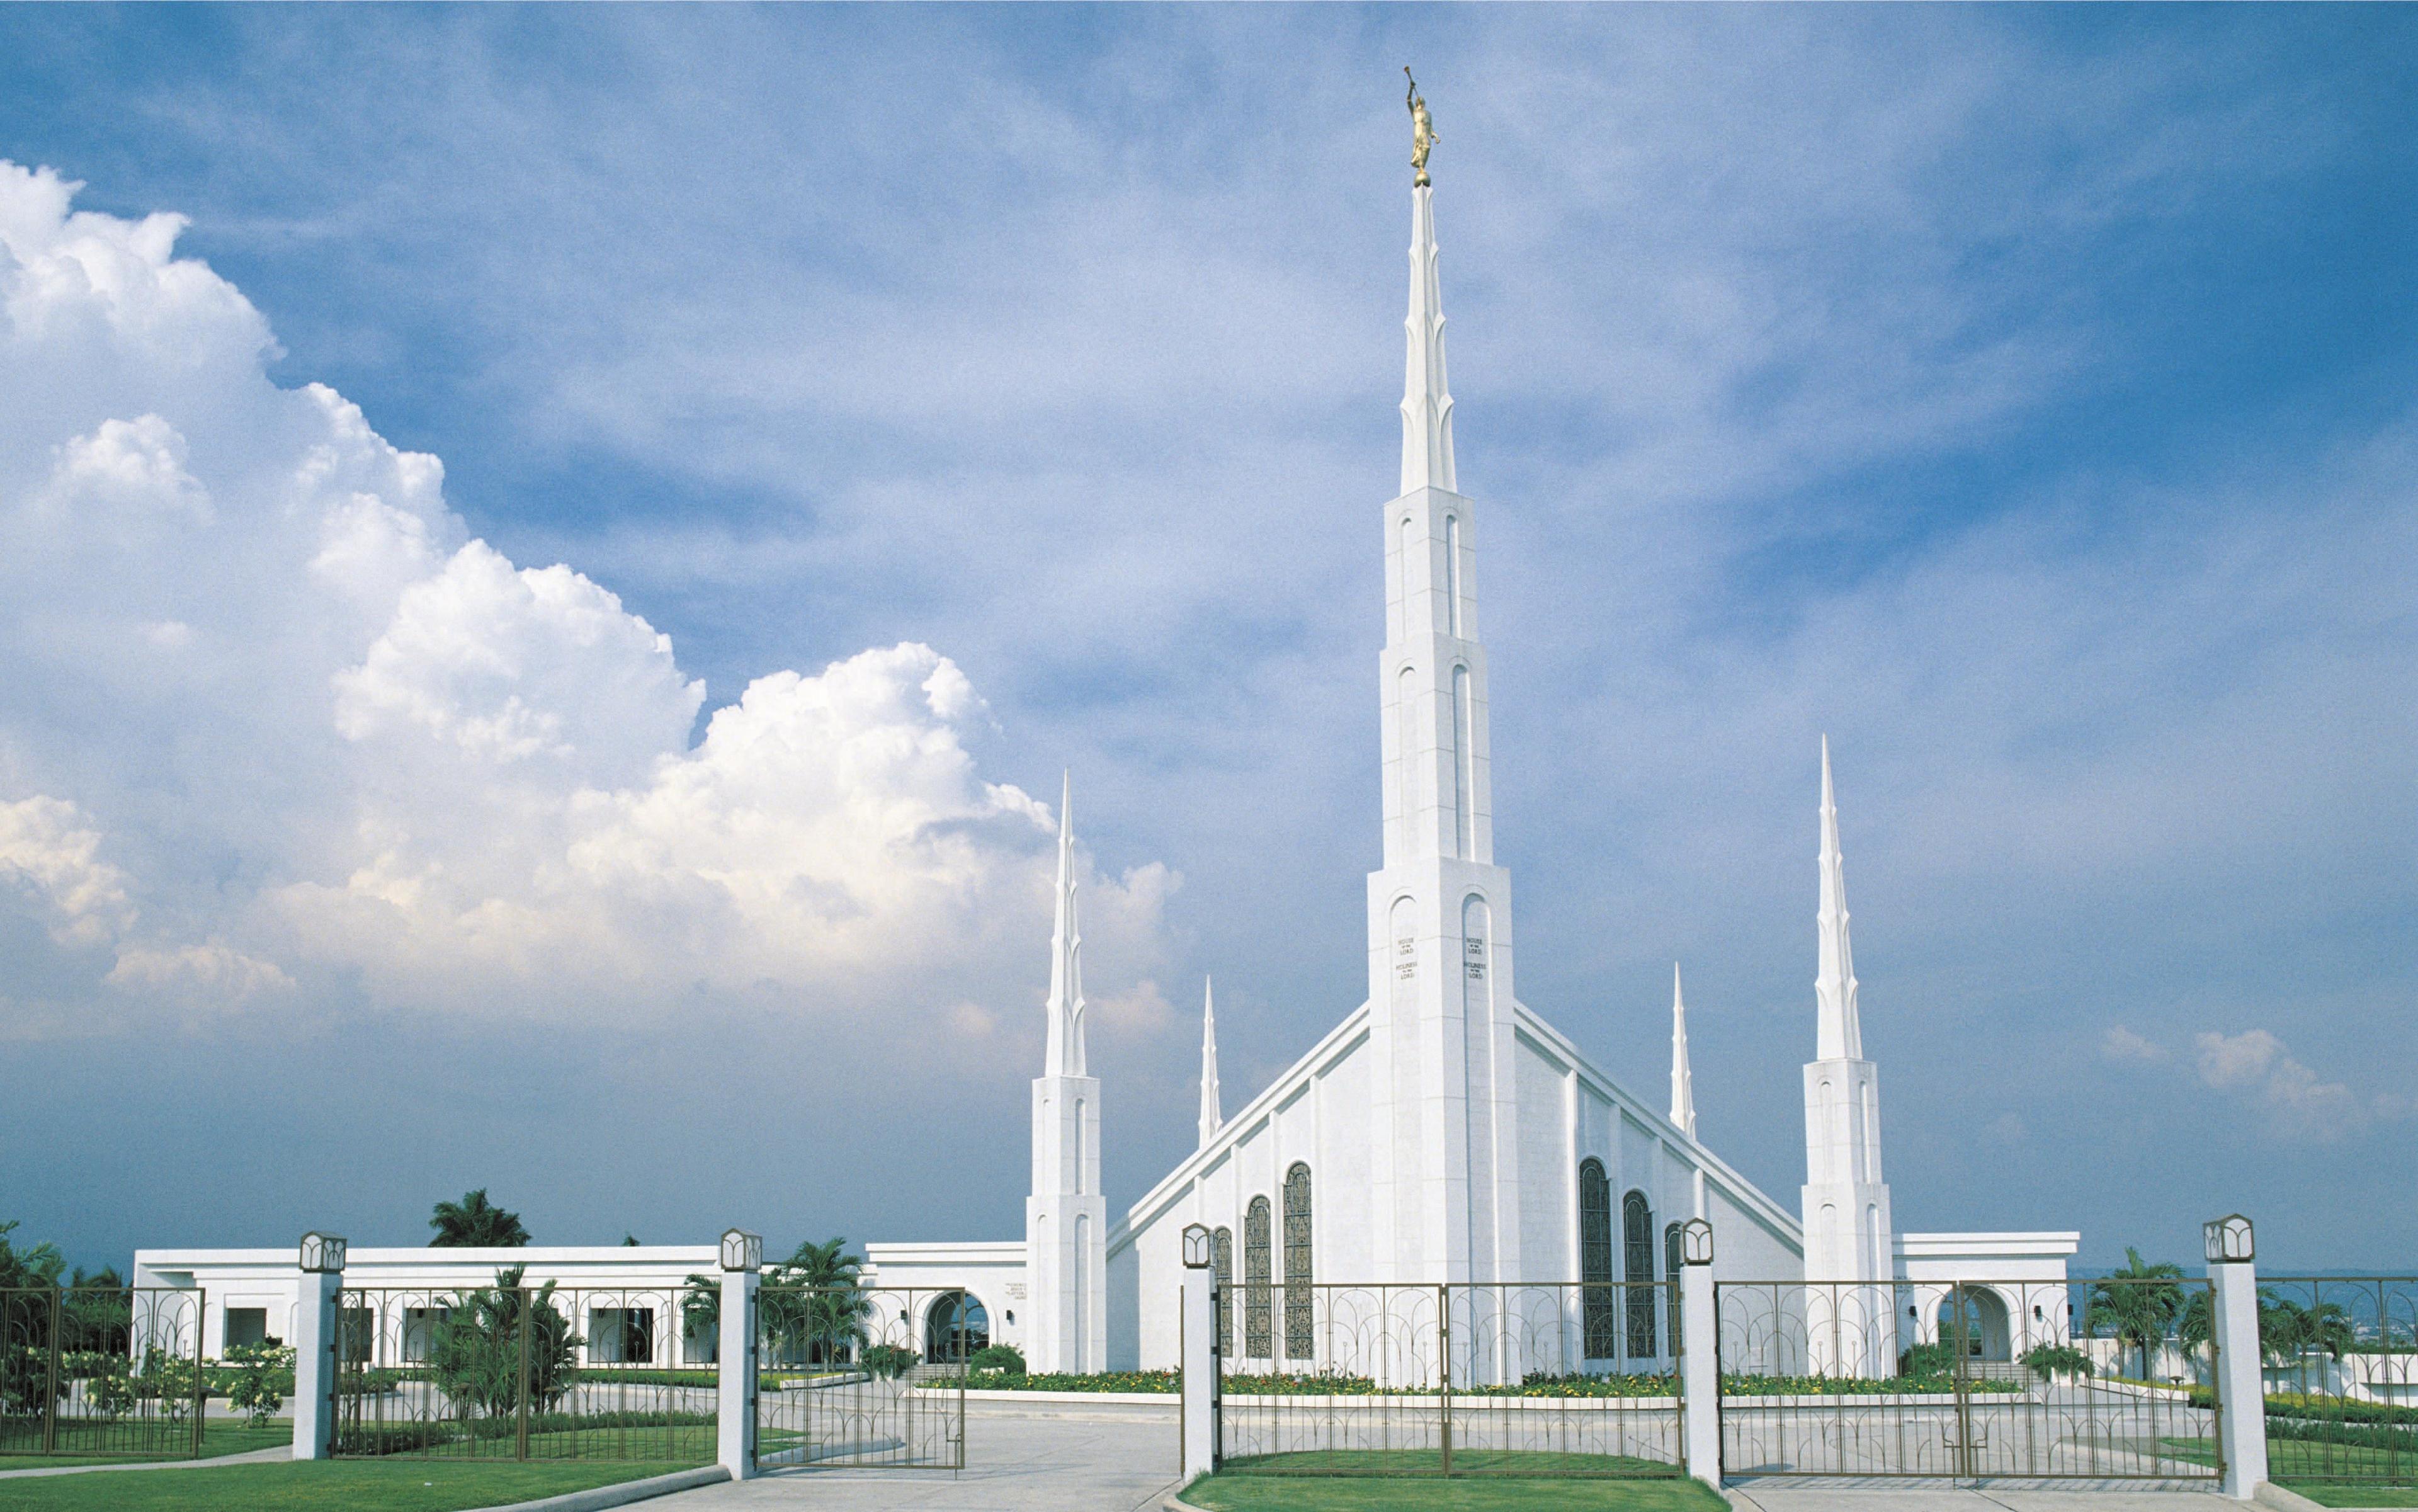 Mormoni kirkko dating site